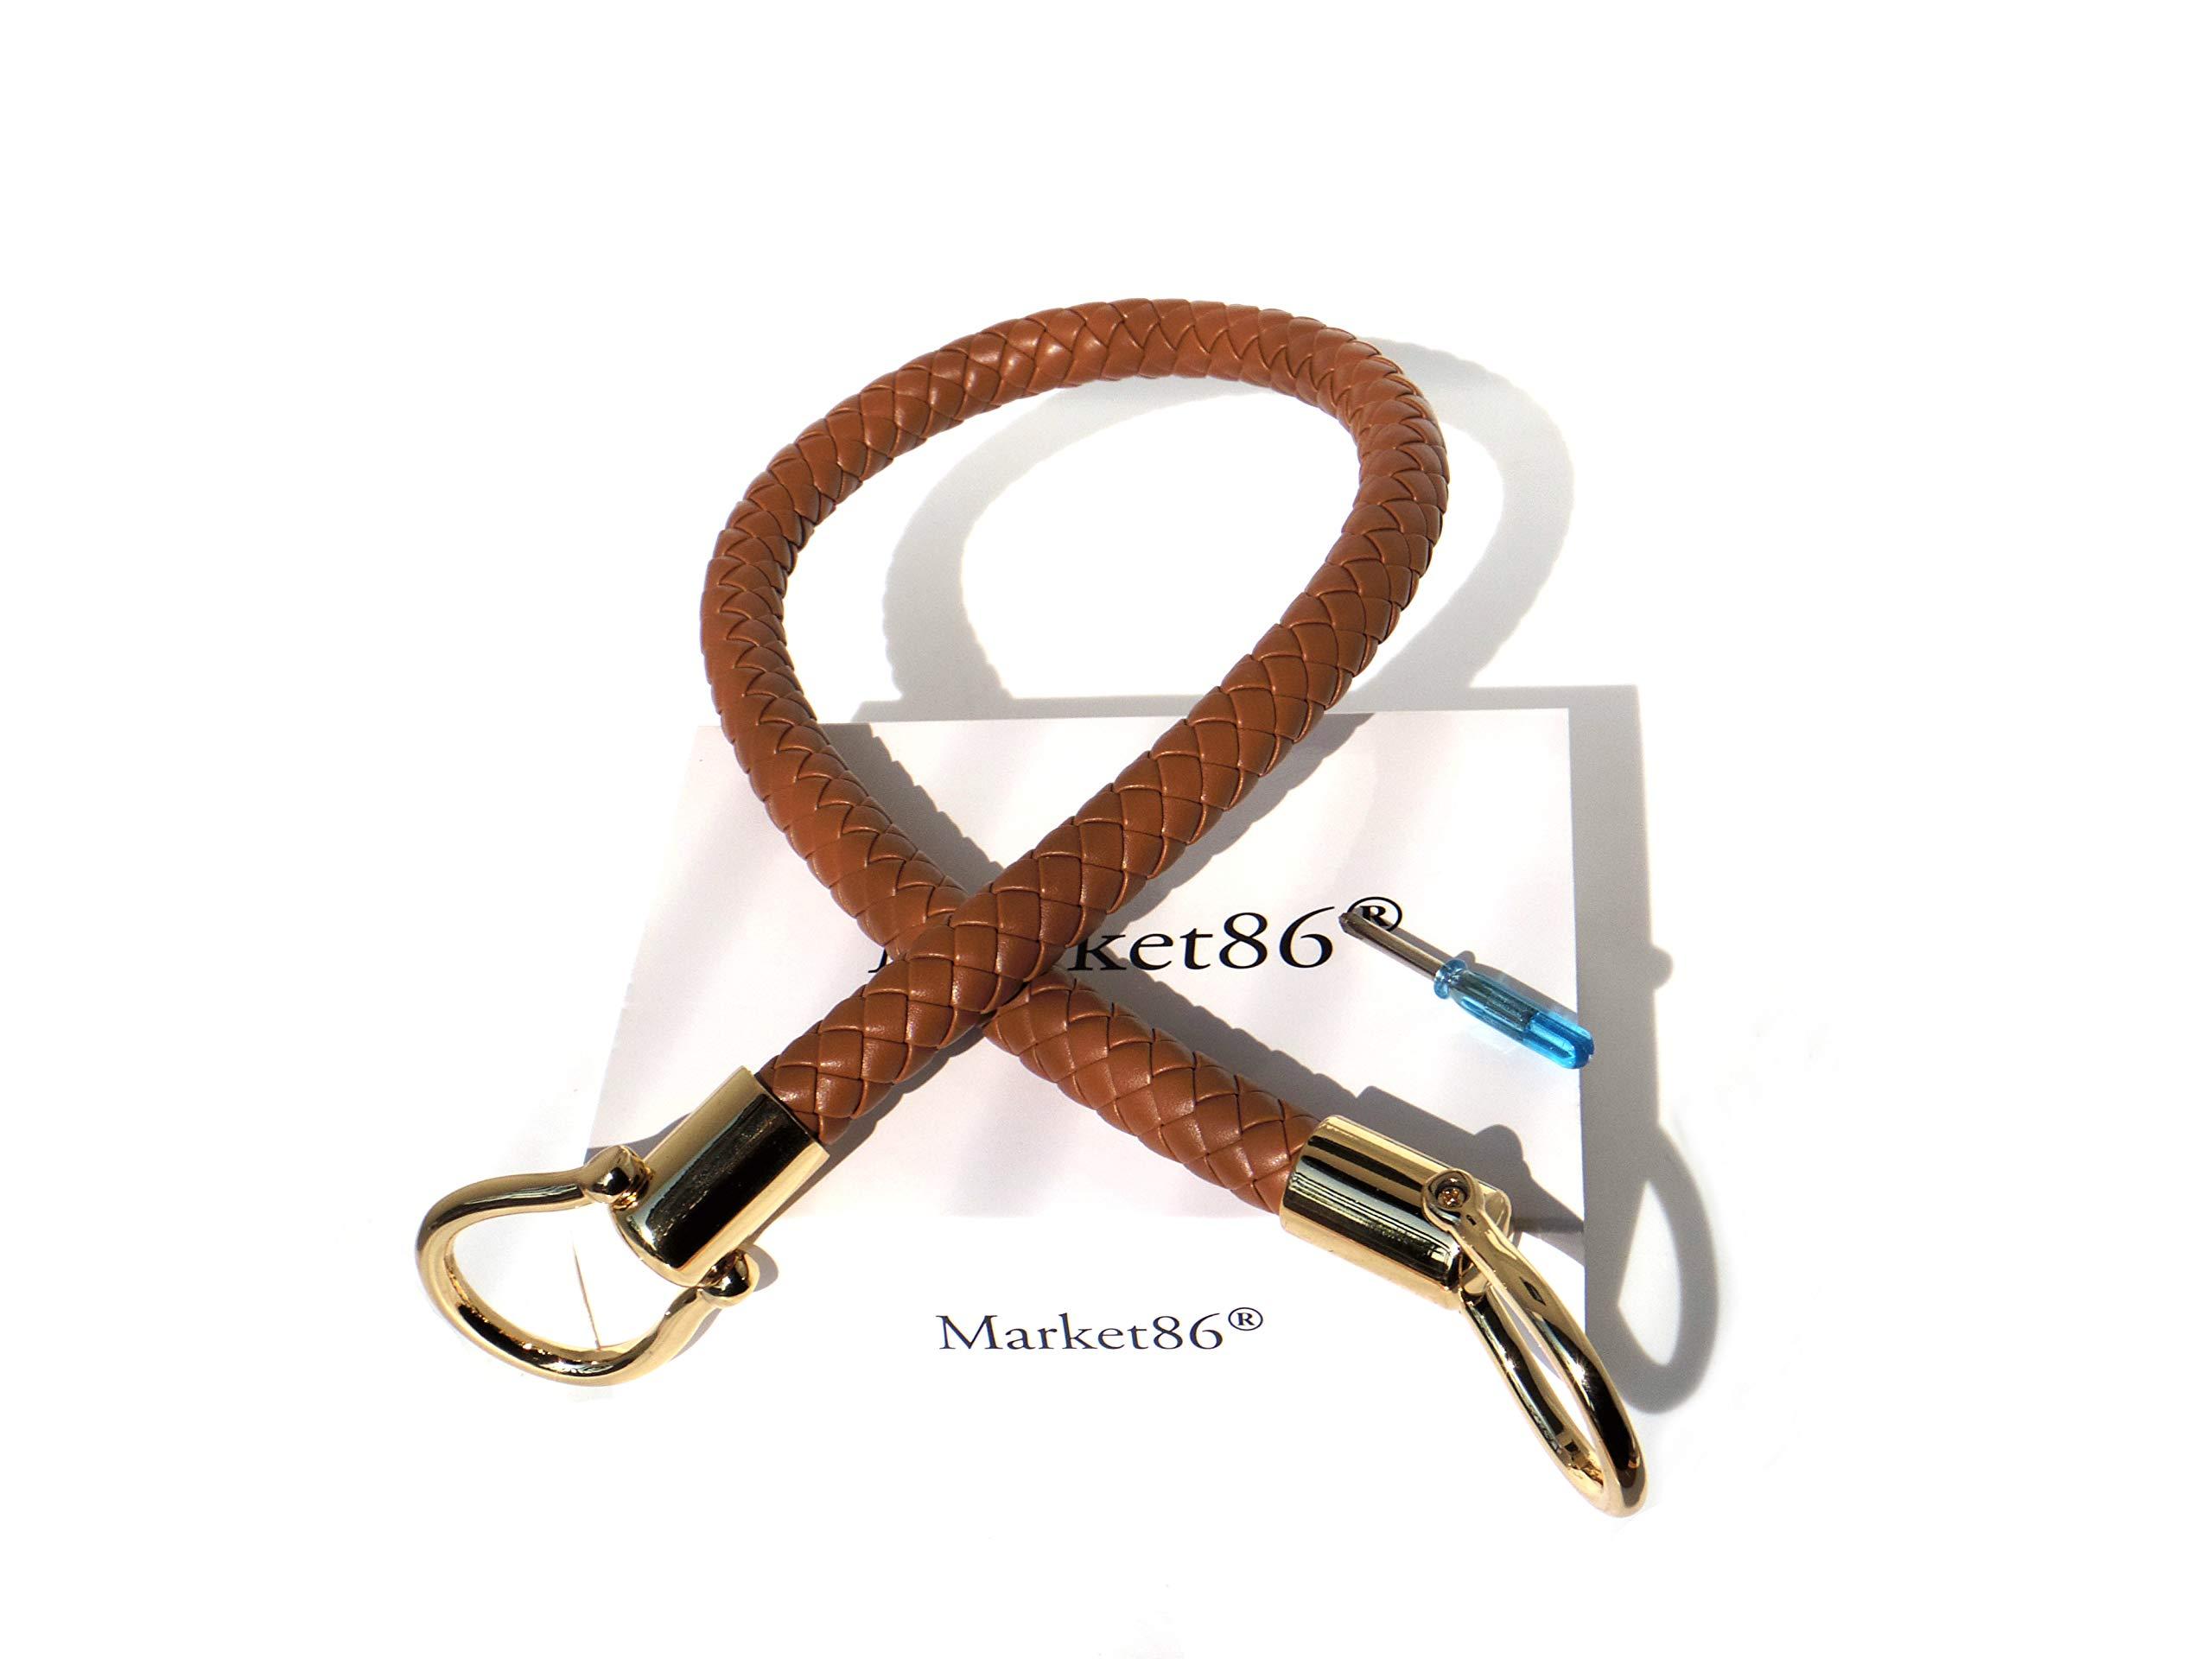 Black market86 13mm Width DIY Handbag Accessories Braided Pu Leather Purse Handles Handbag Replacement Straps Detachable Bunckles Length 23.6 Inches